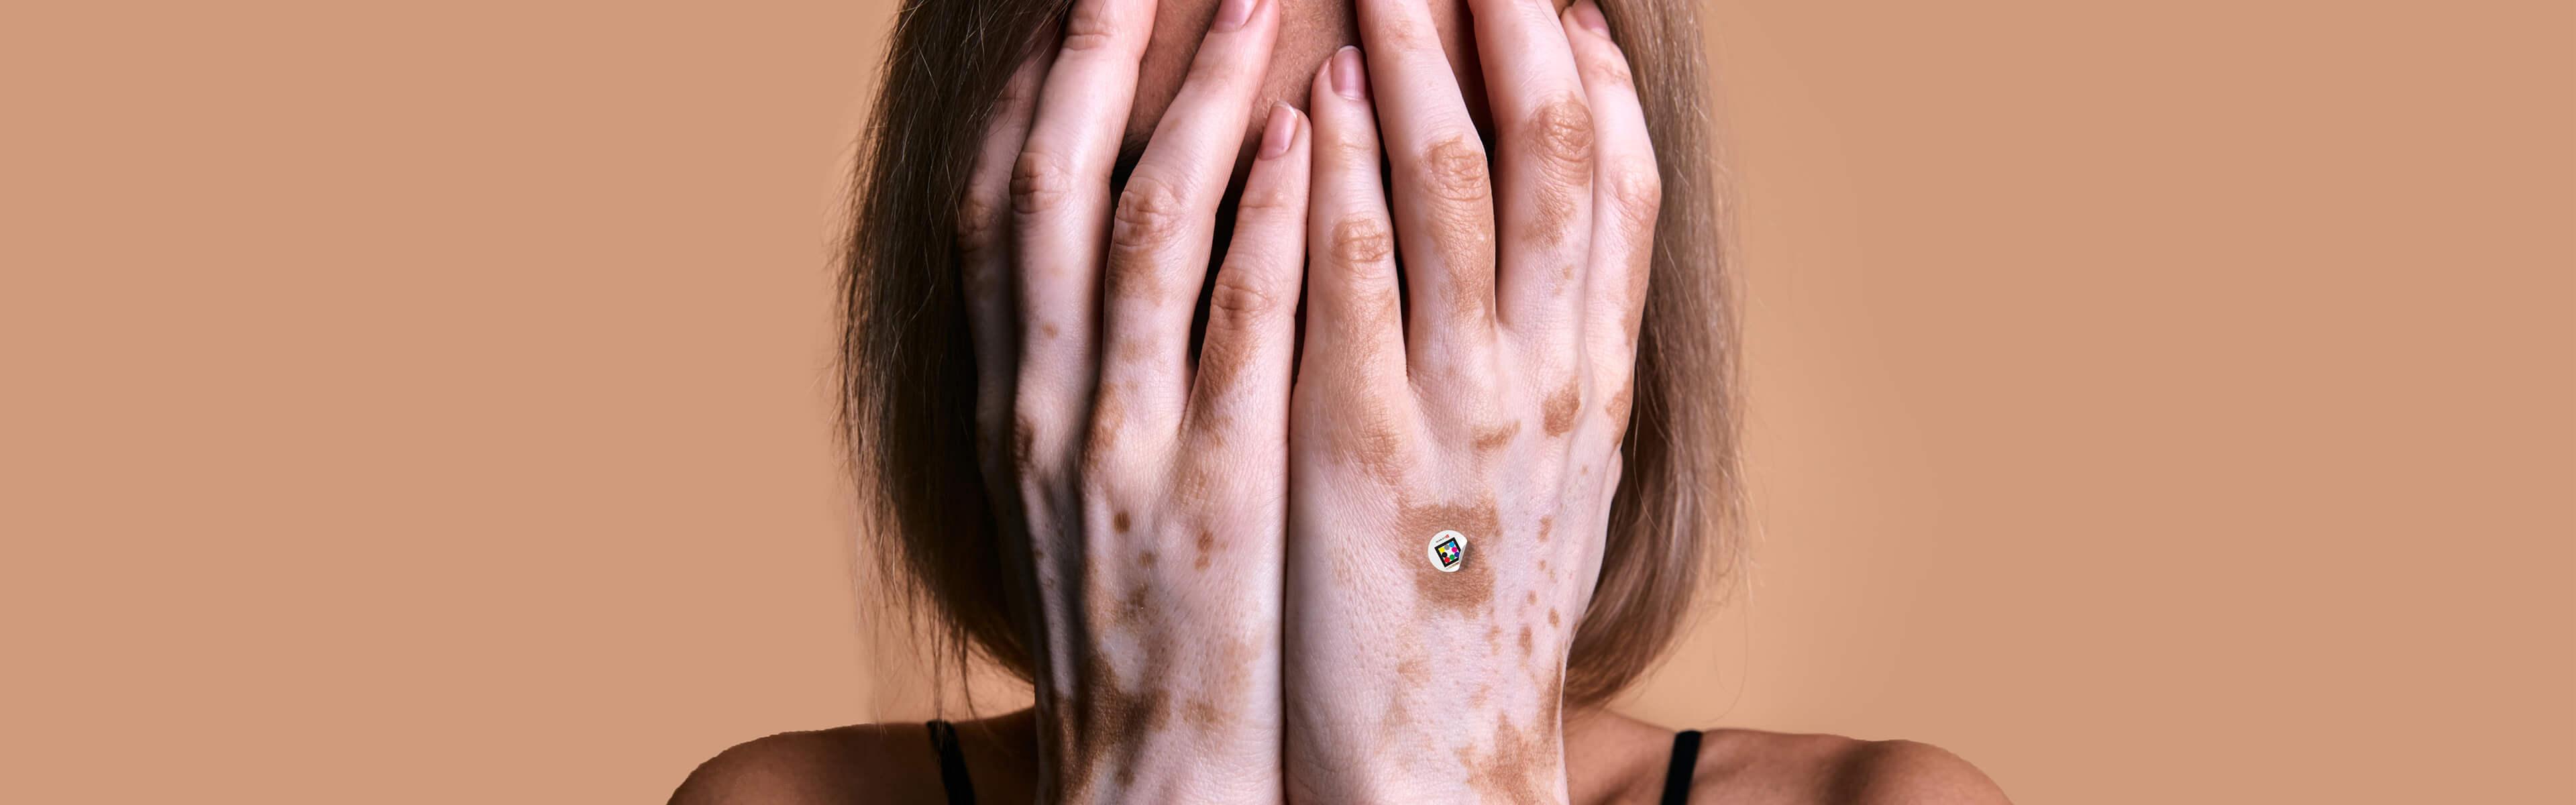 Objective assessment and color quantification of vitiligo